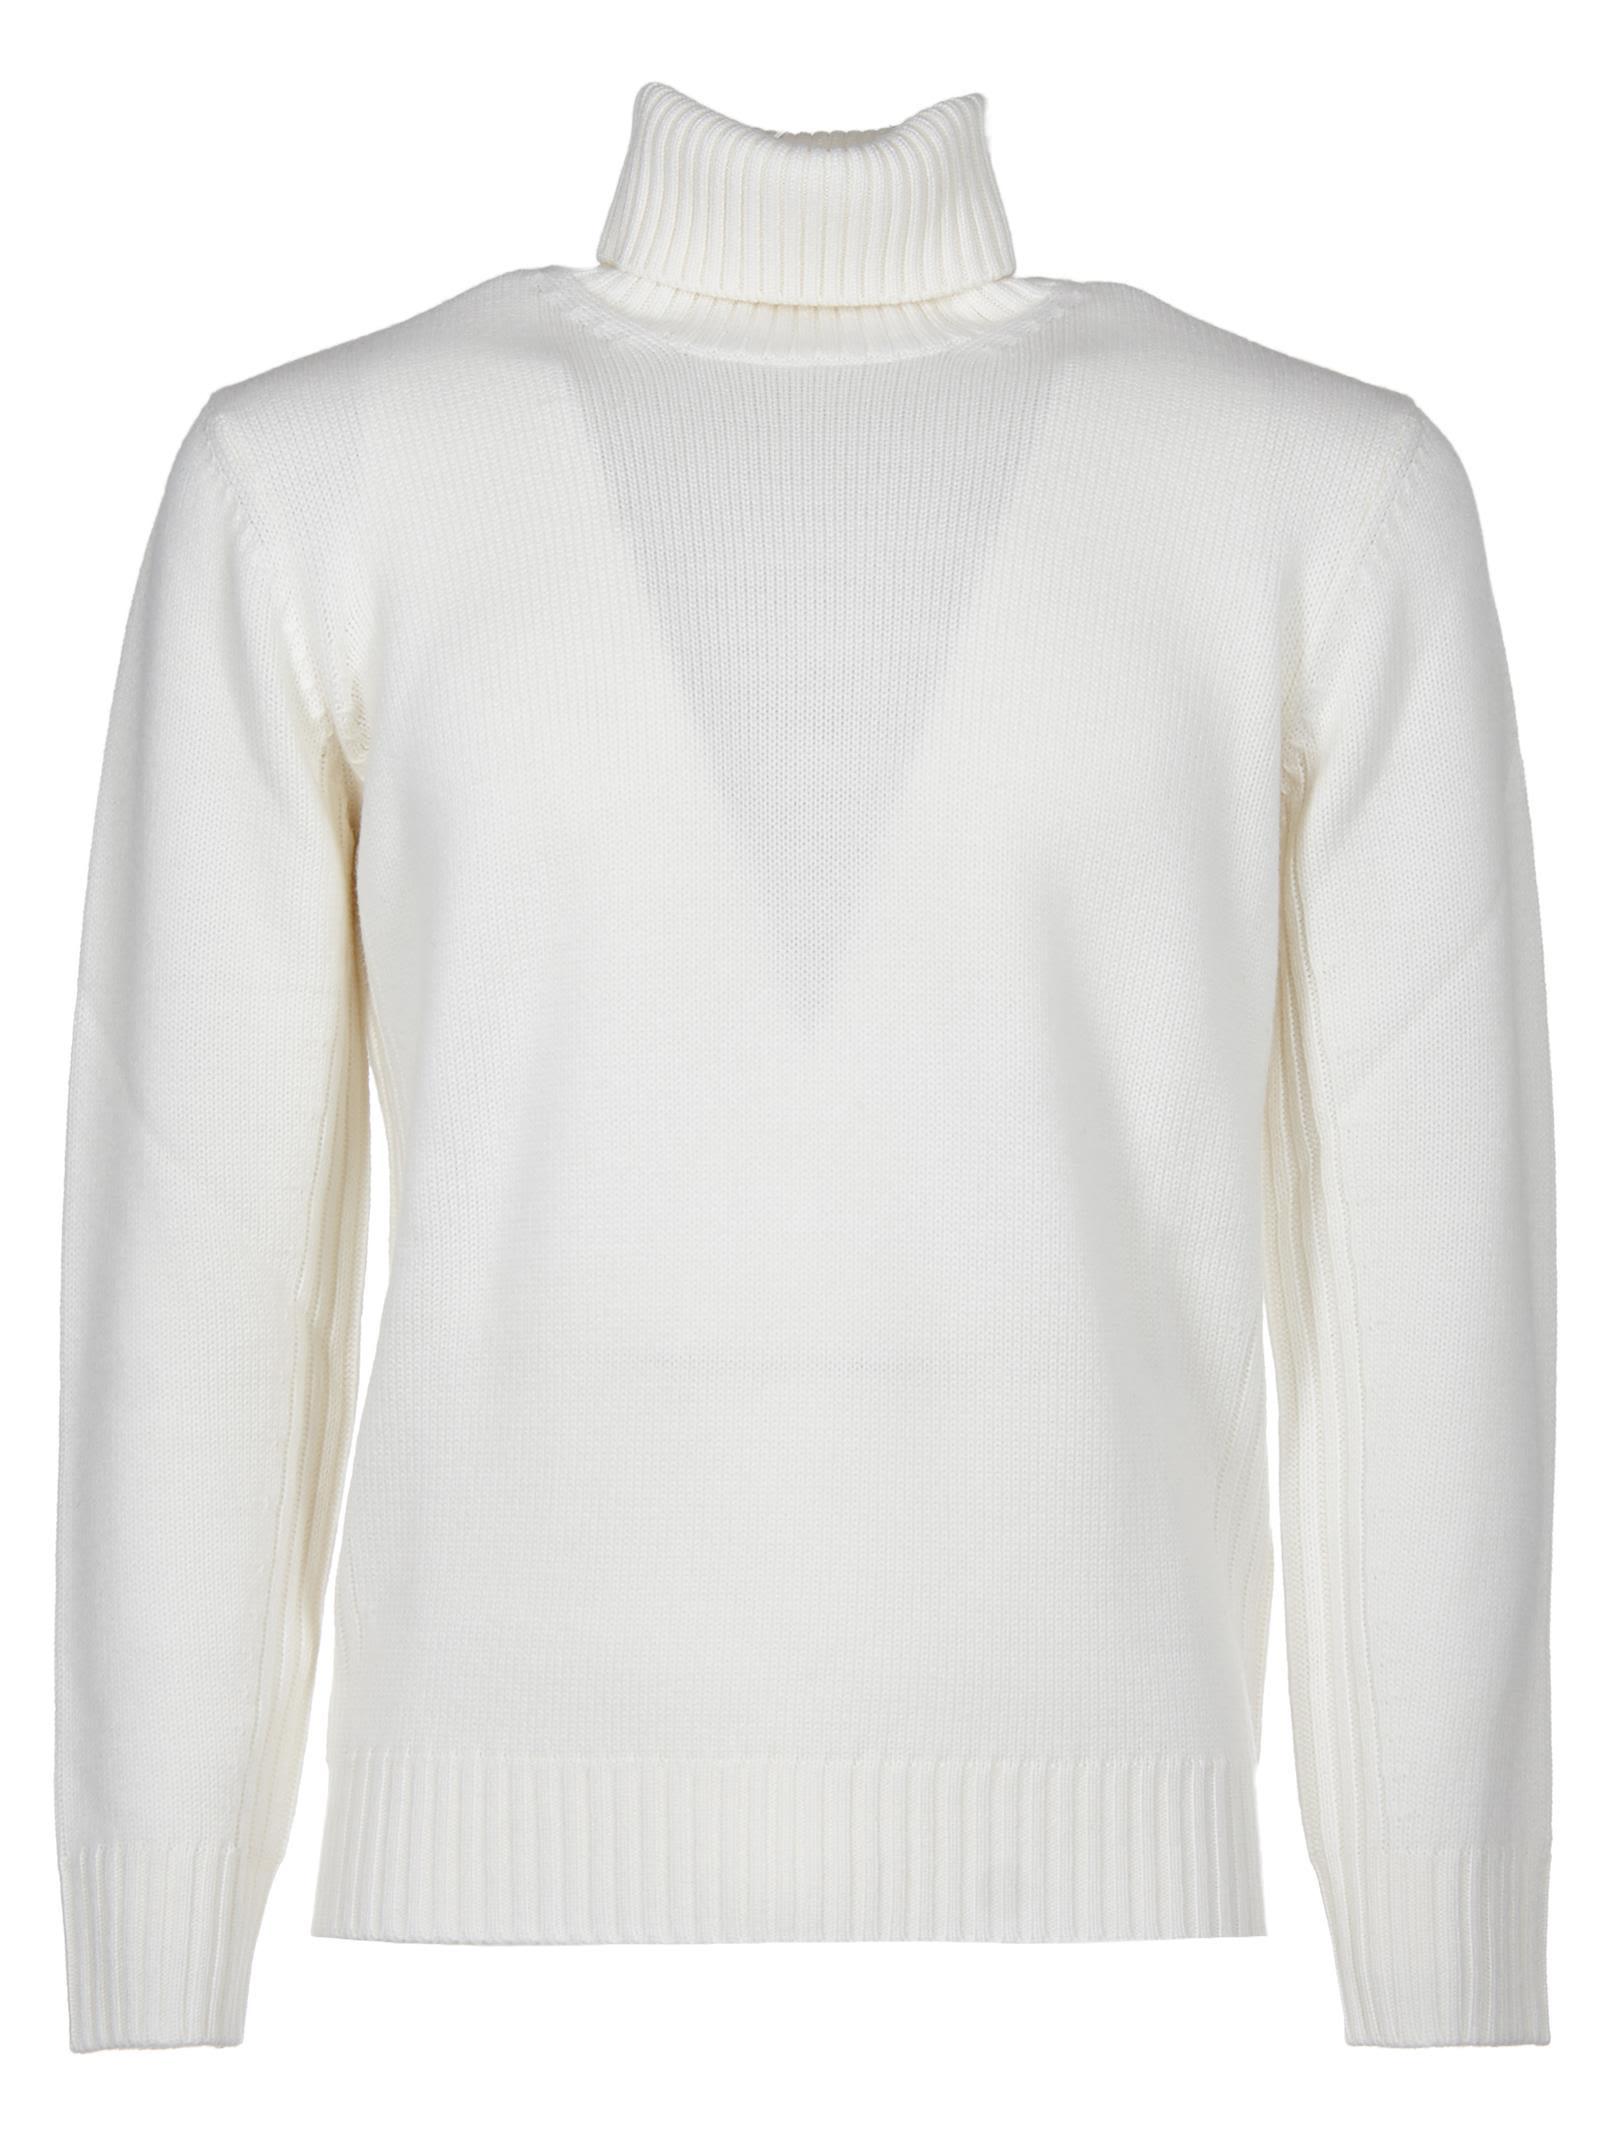 KANGRA Roll Neck Sweater in White